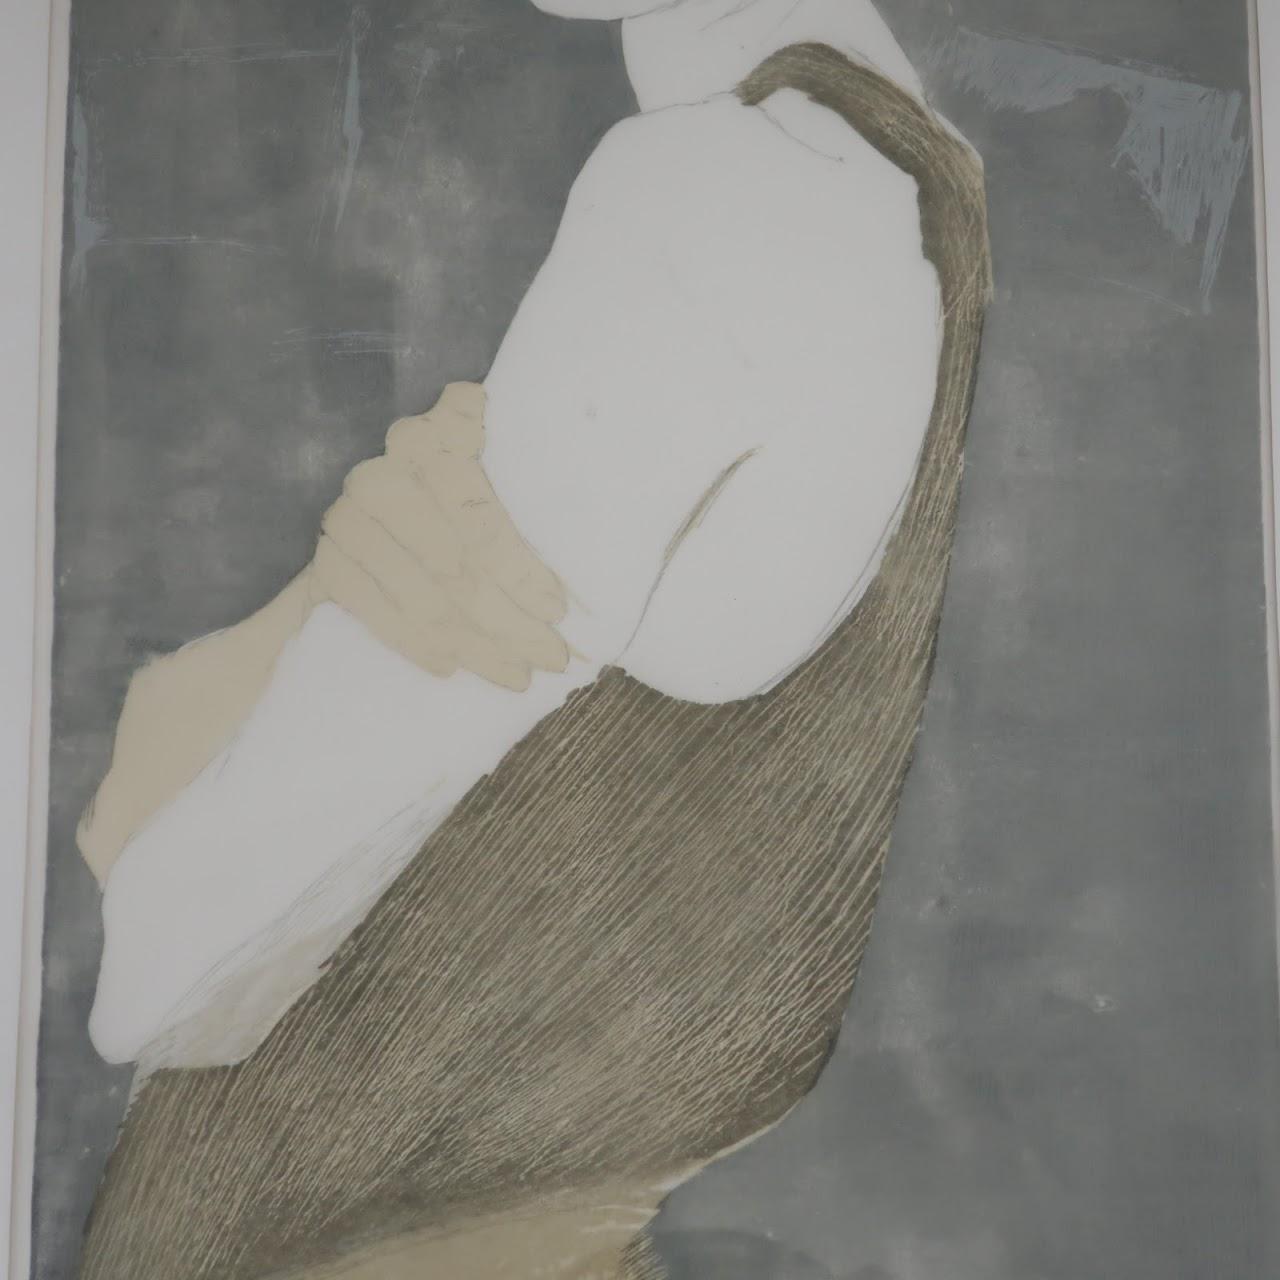 Signed Lithographic Portrait 1